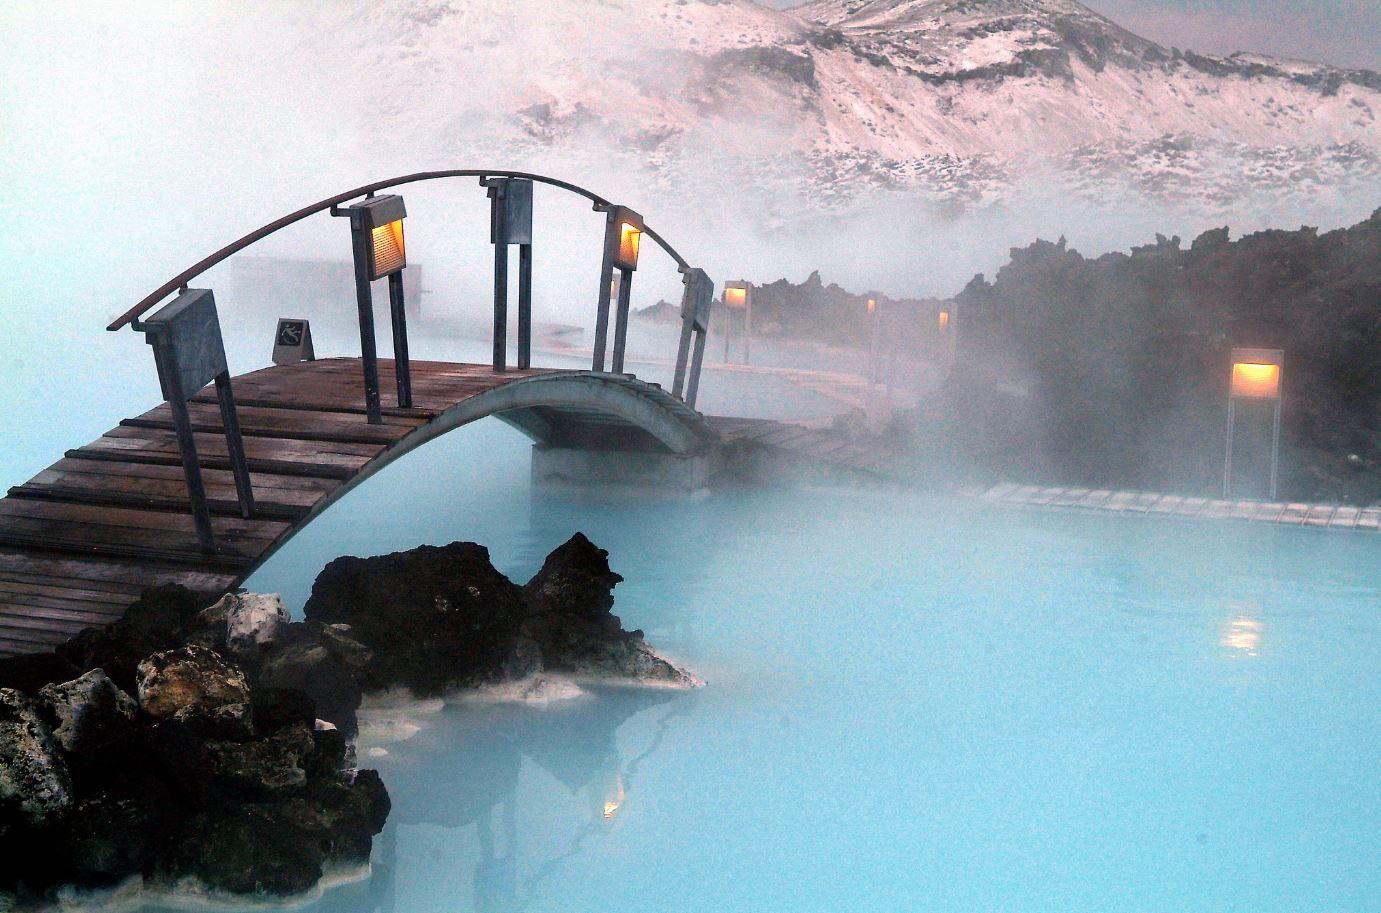 Iceland 4 - Blue Lagoon